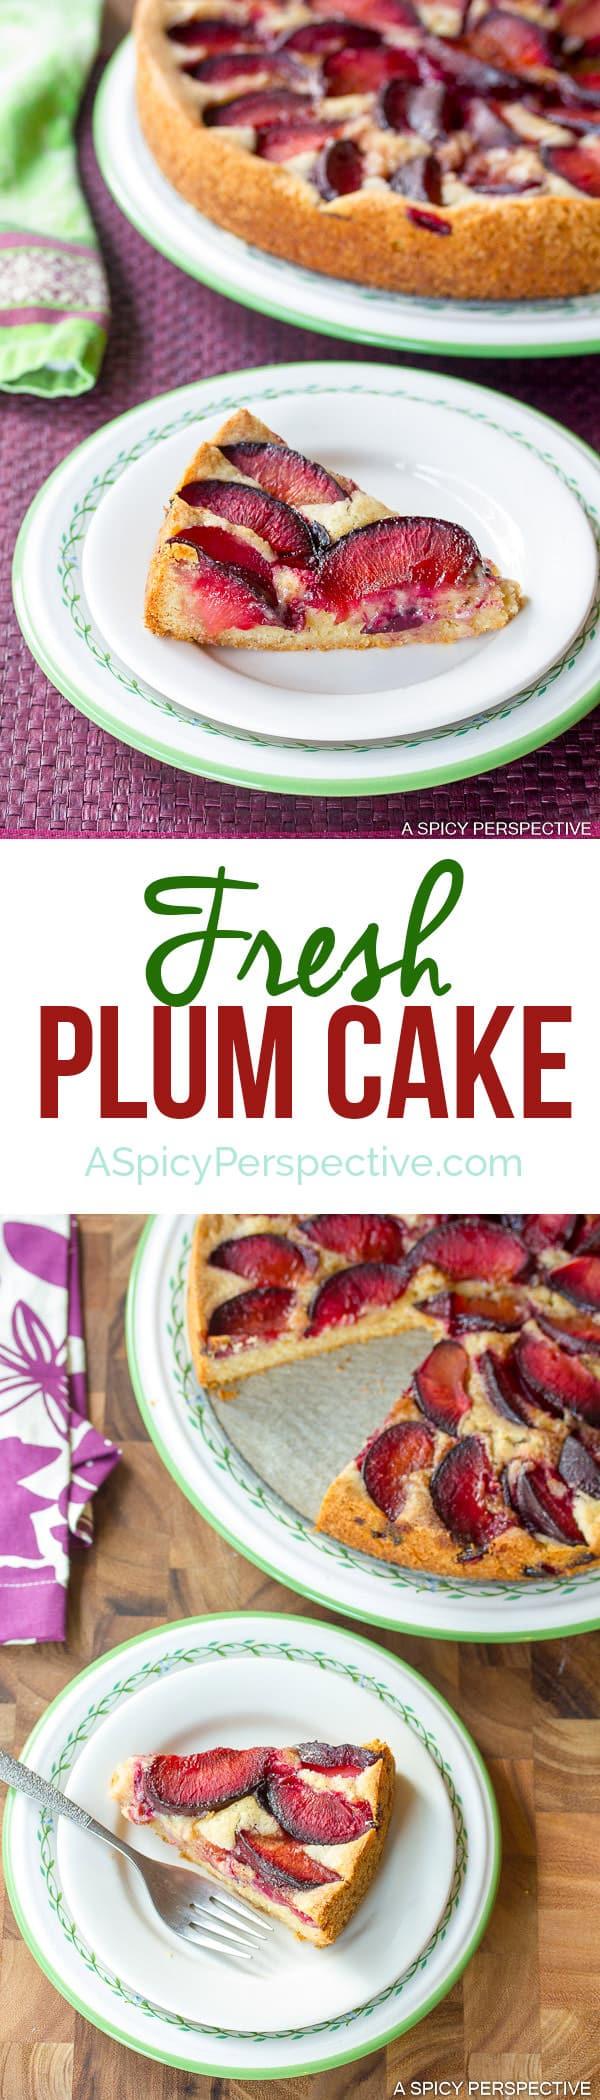 Fresh Plum Cake on ASpicyPerspective.com